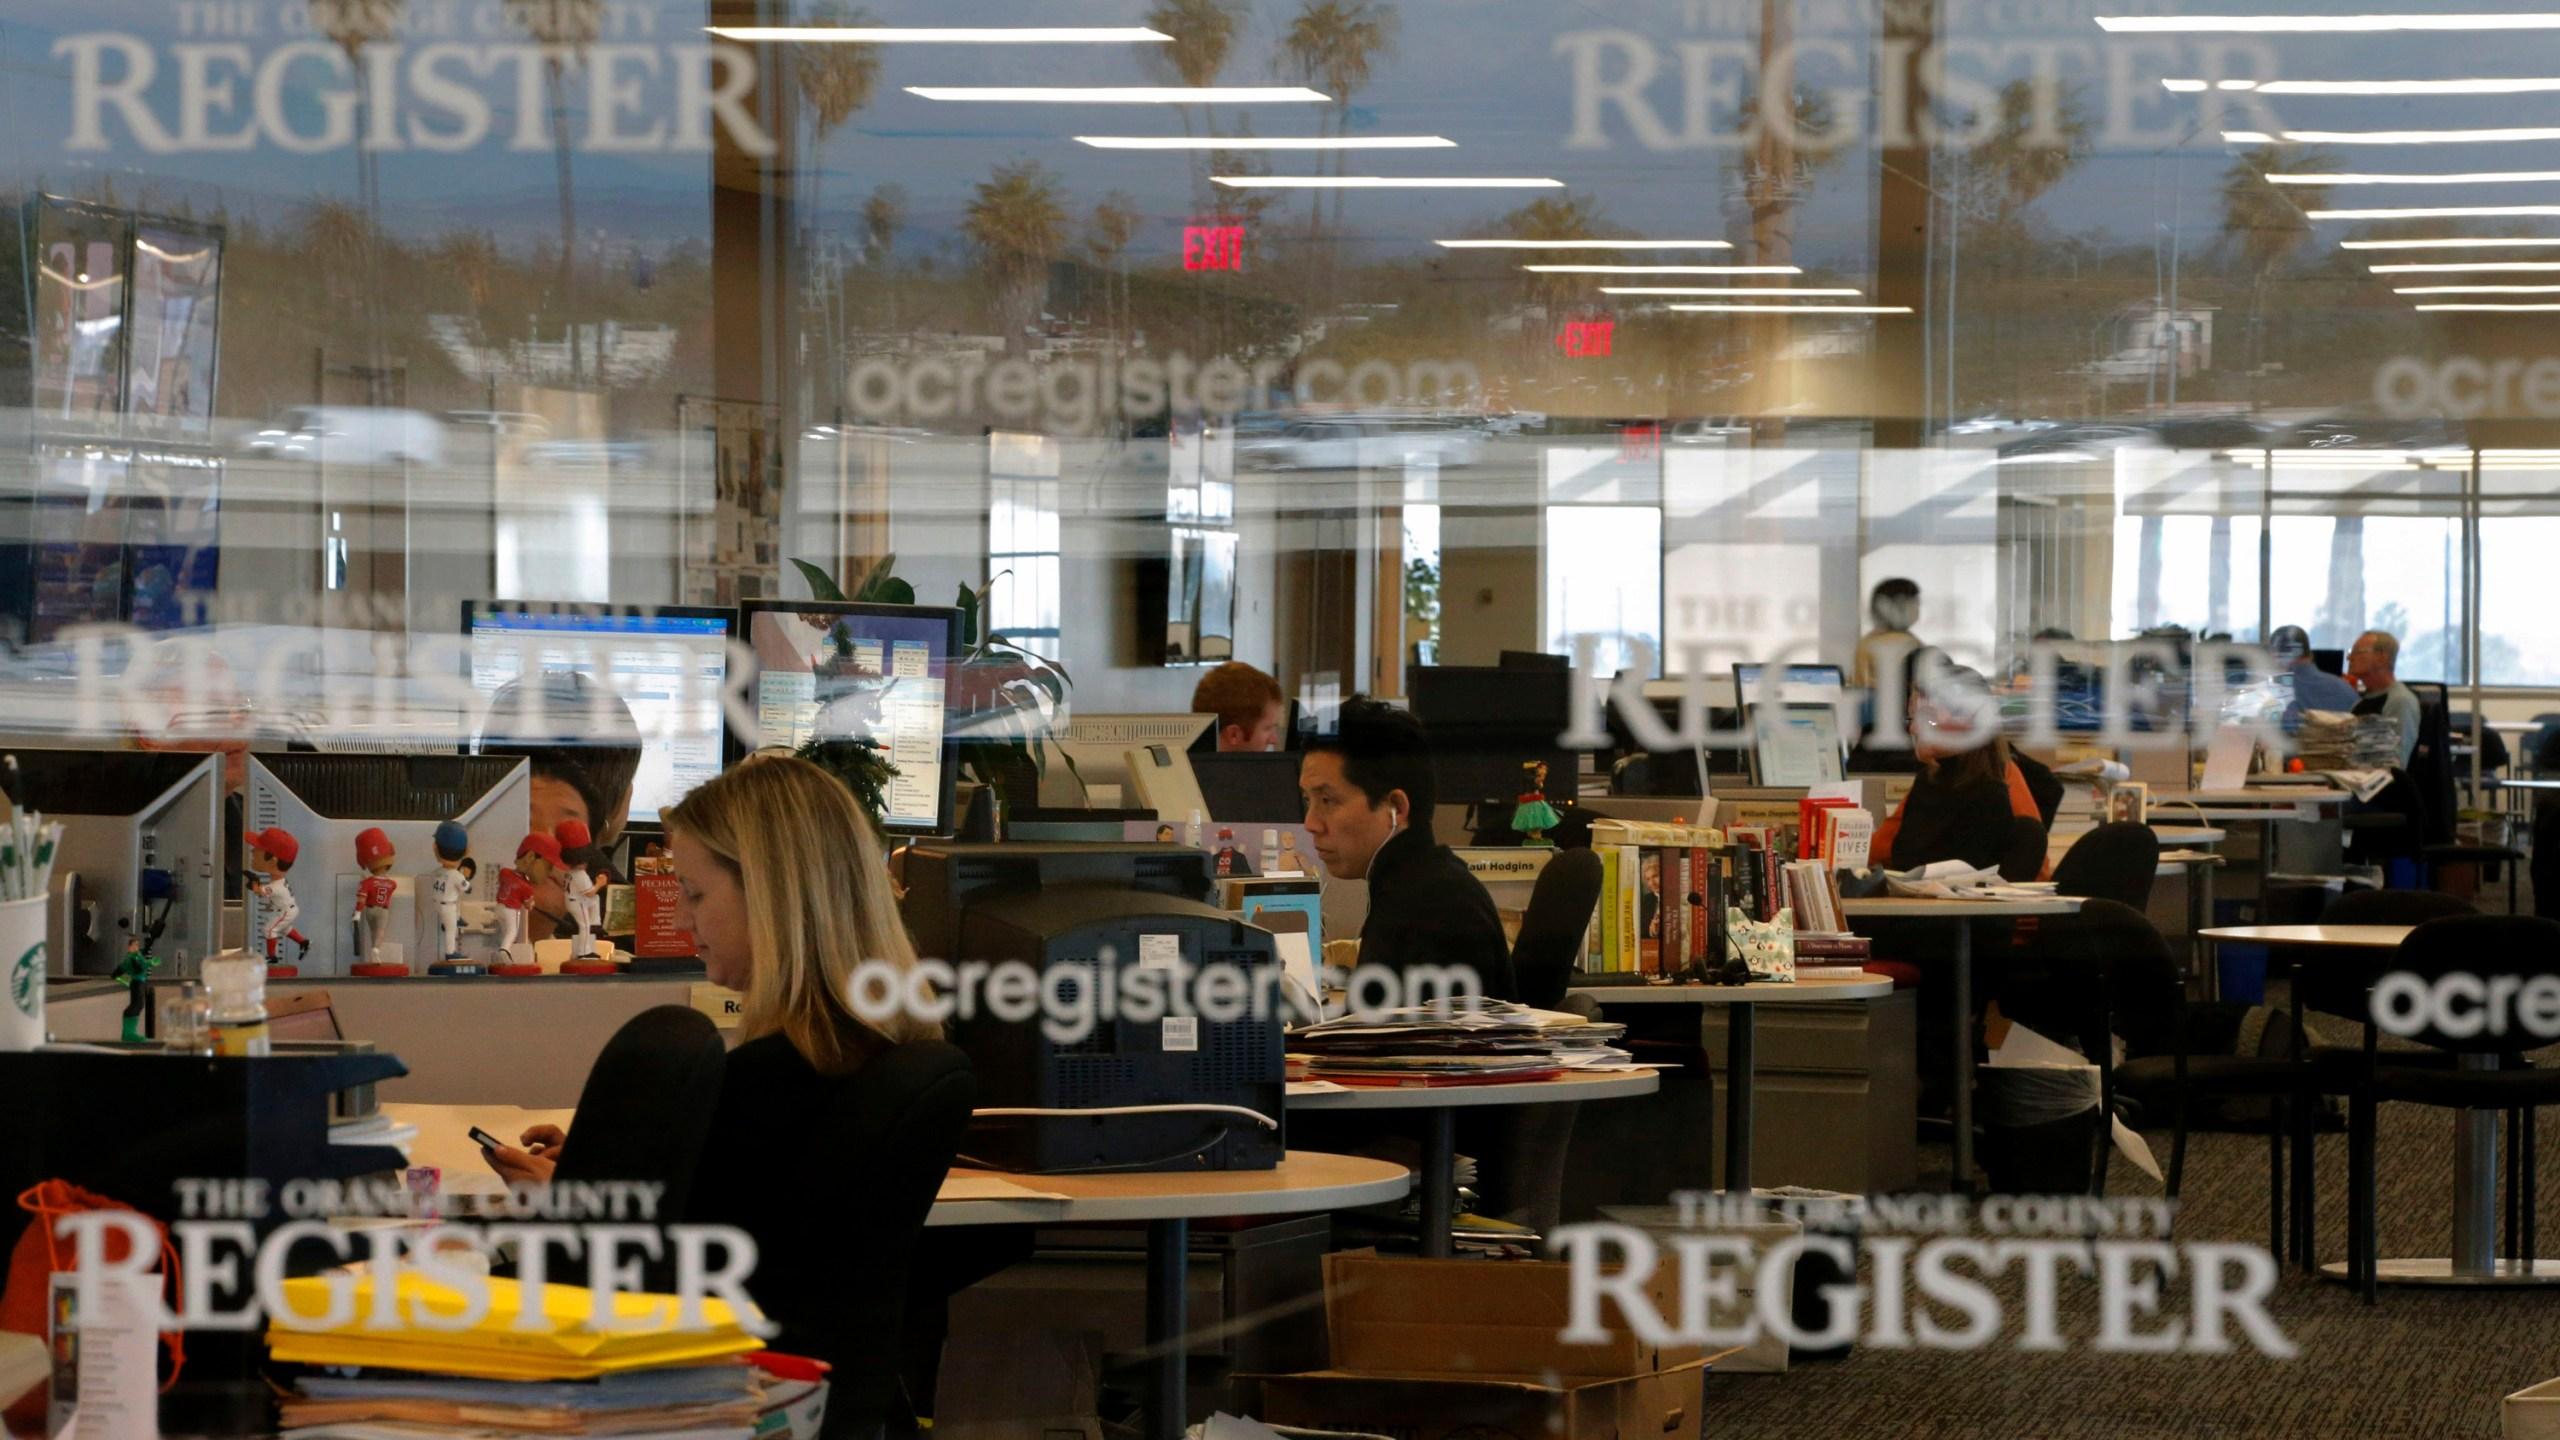 This Dec. 27, 2012 file photo shows the newsroom of the Orange County Register in Santa Ana, Calif. (AP Photo/Jae C. Hong, File)